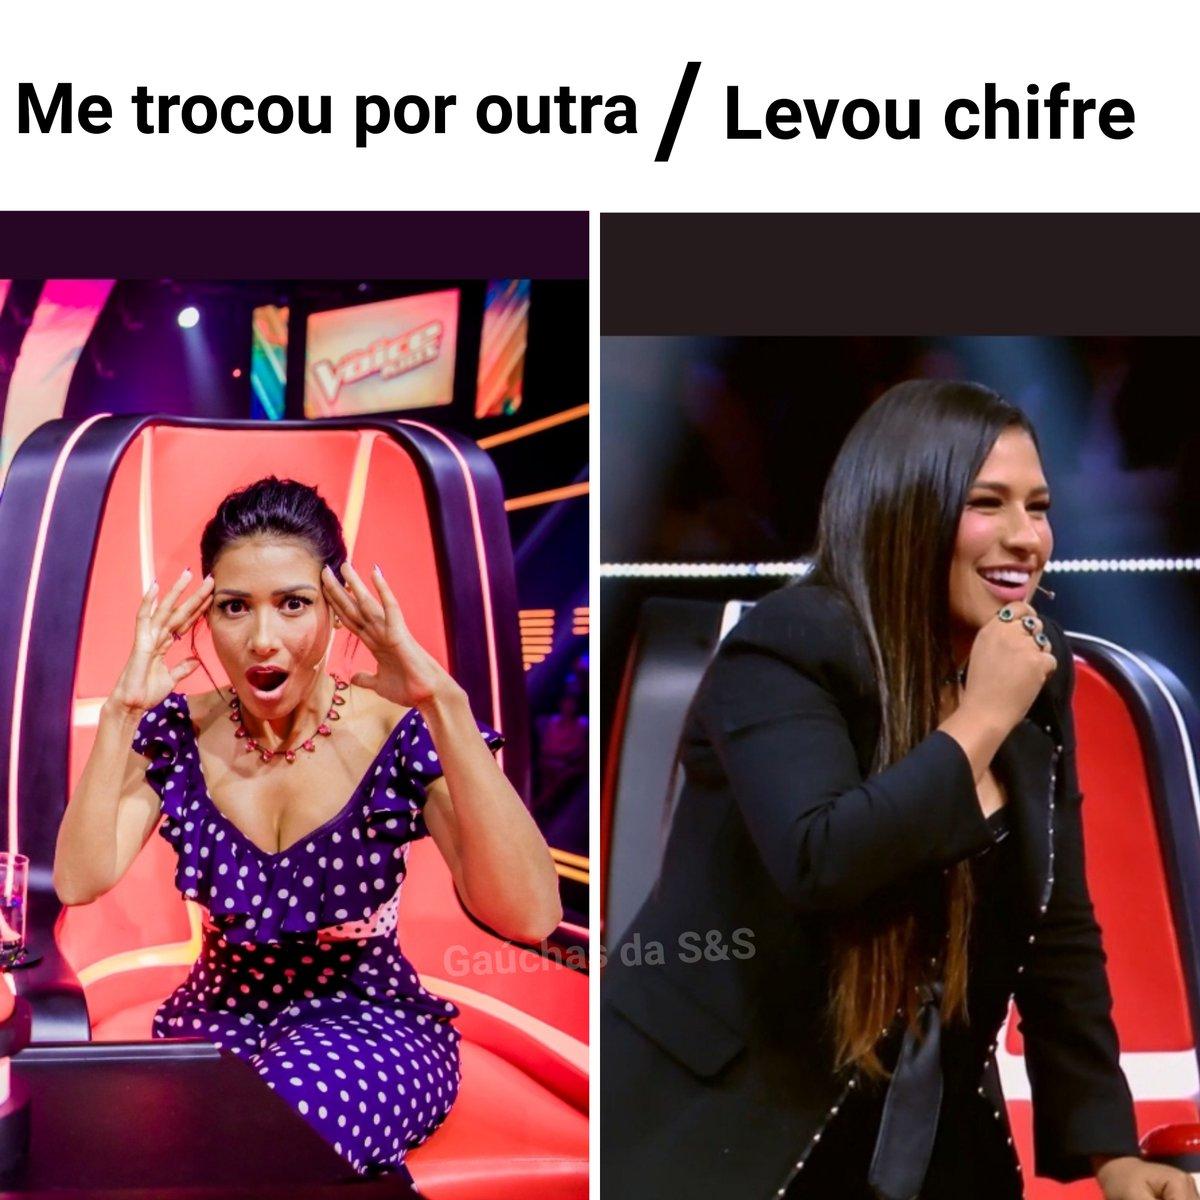 Simone e Silmara #memes ''viral da internet''